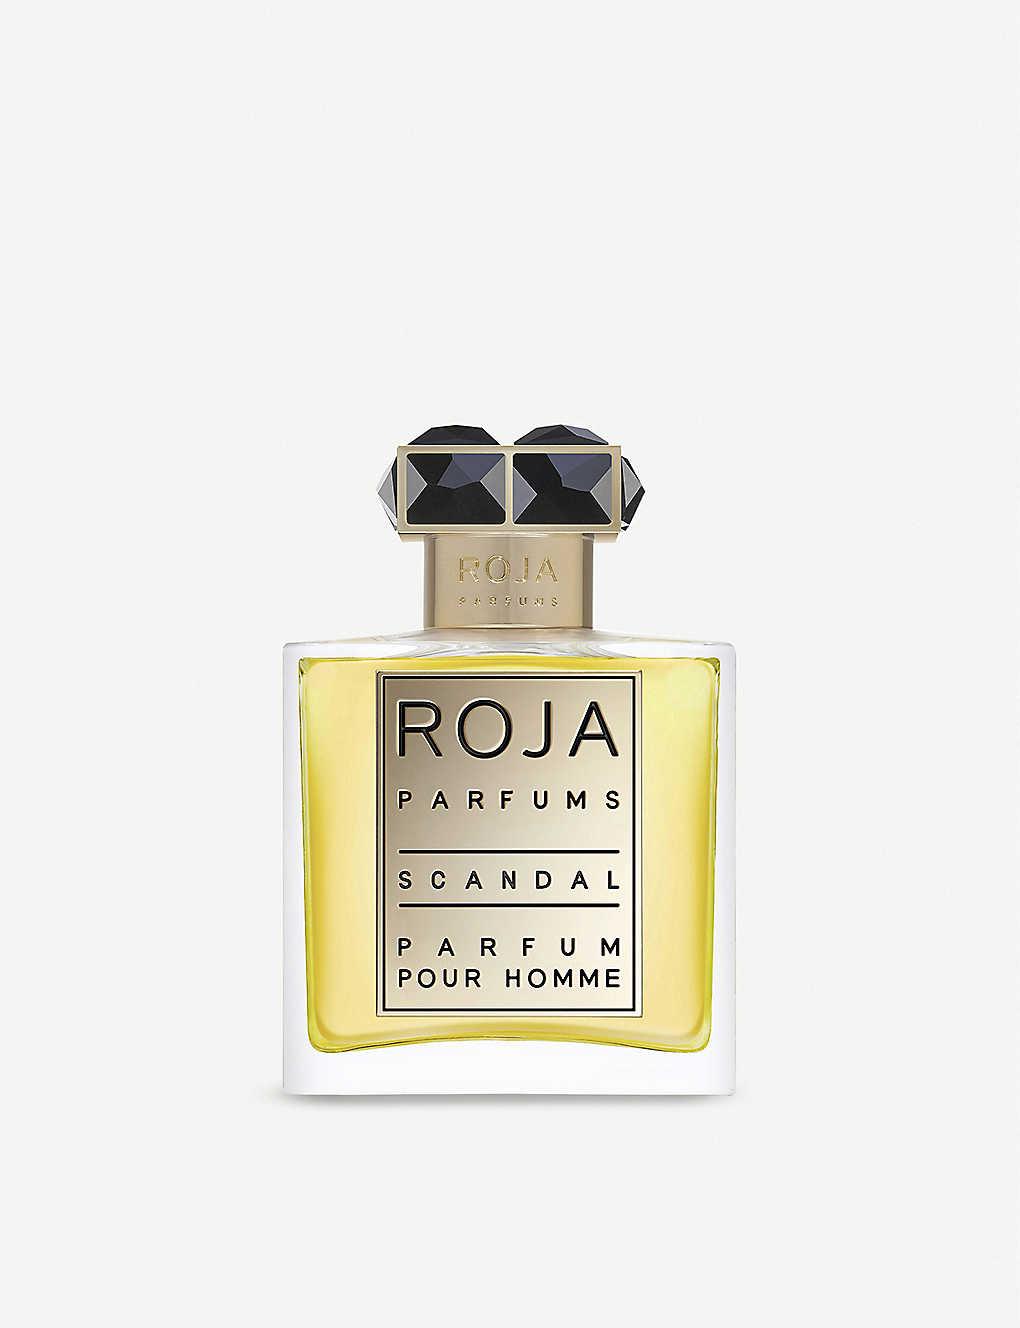 Roja Parfums Scandal Parfum Pour Homme 50ml Selfridgescom